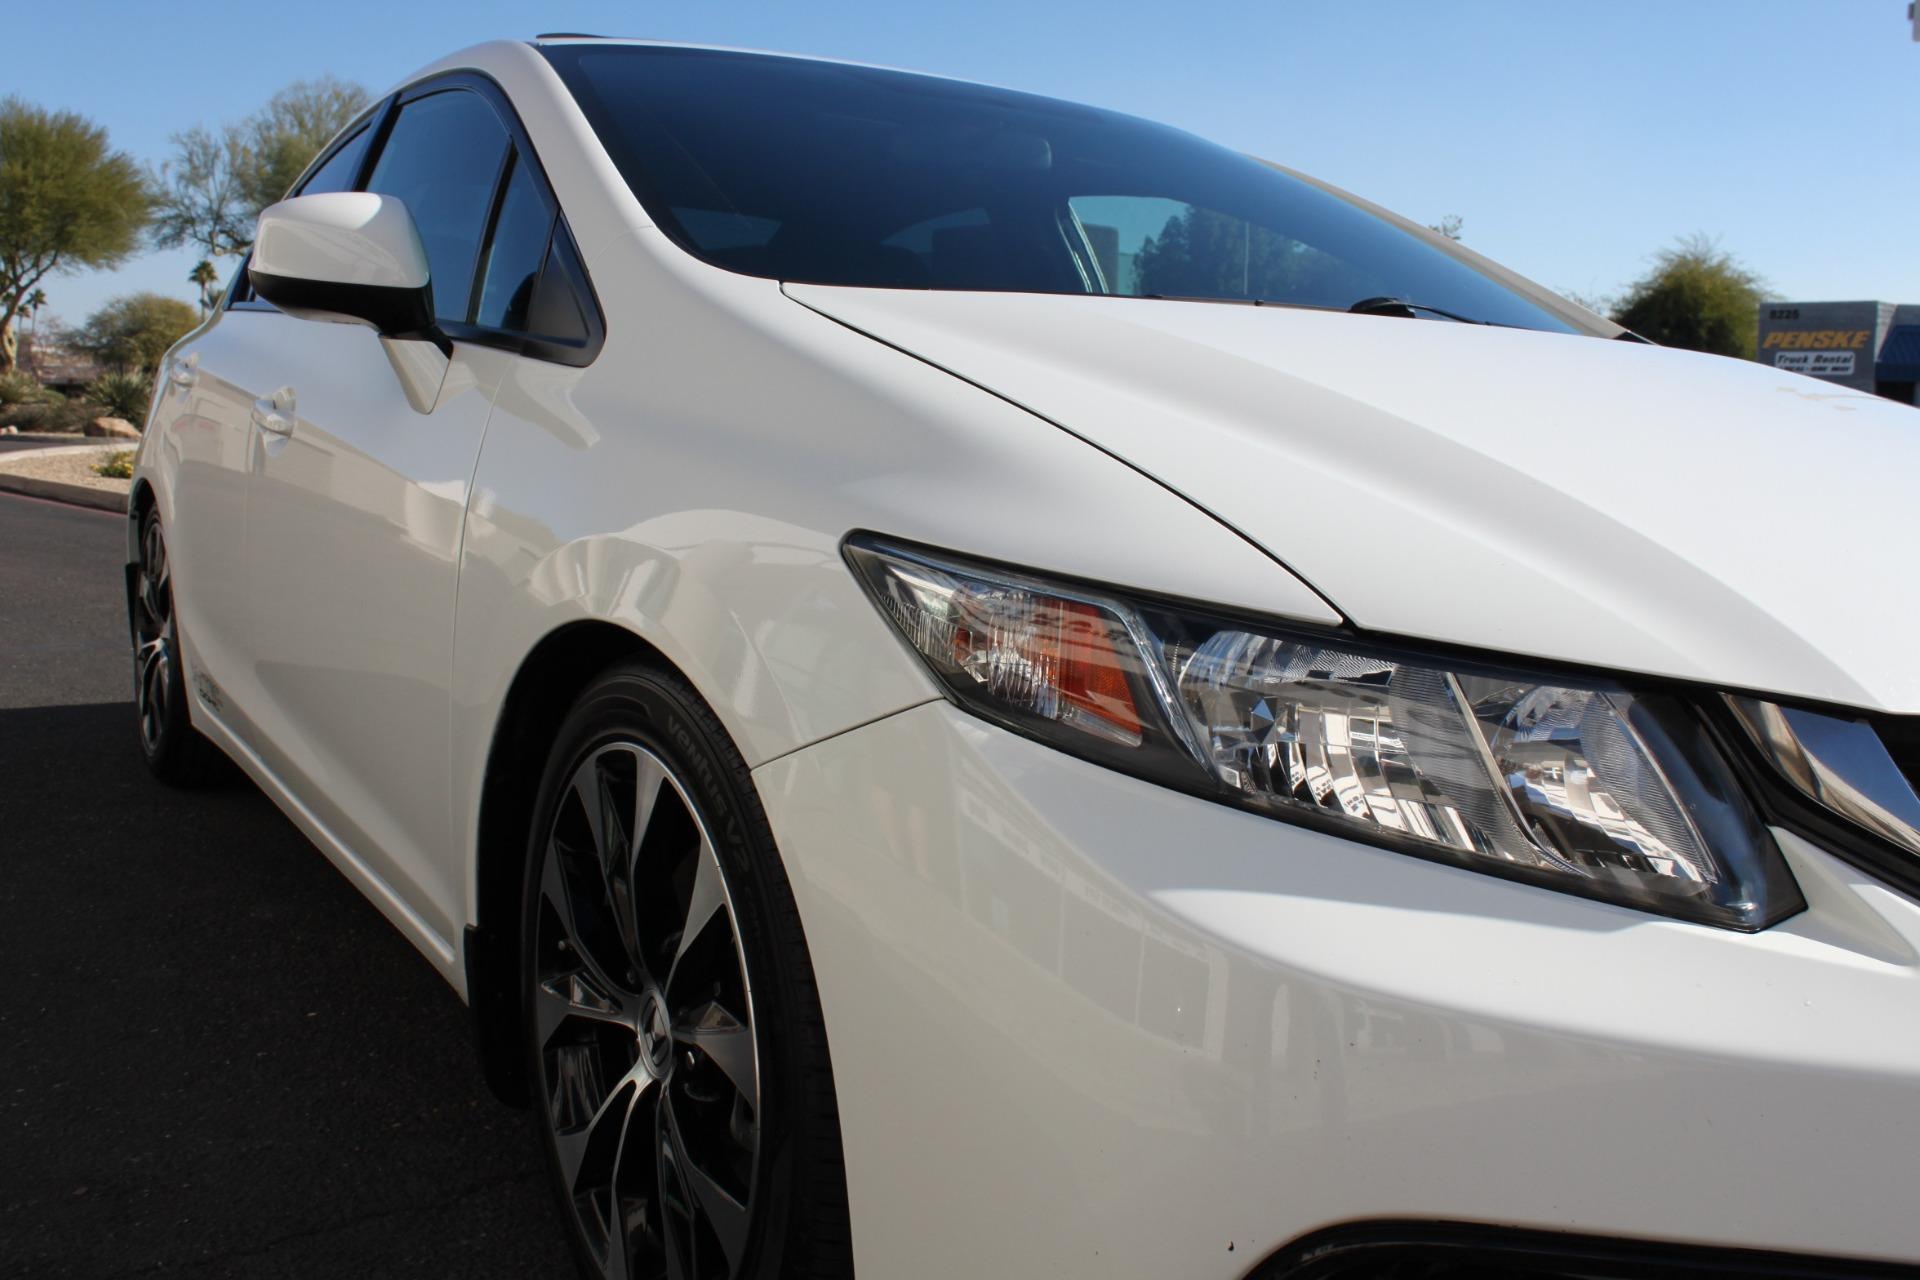 Used-2013-Honda-Civic-Sedan-Si-Chevelle